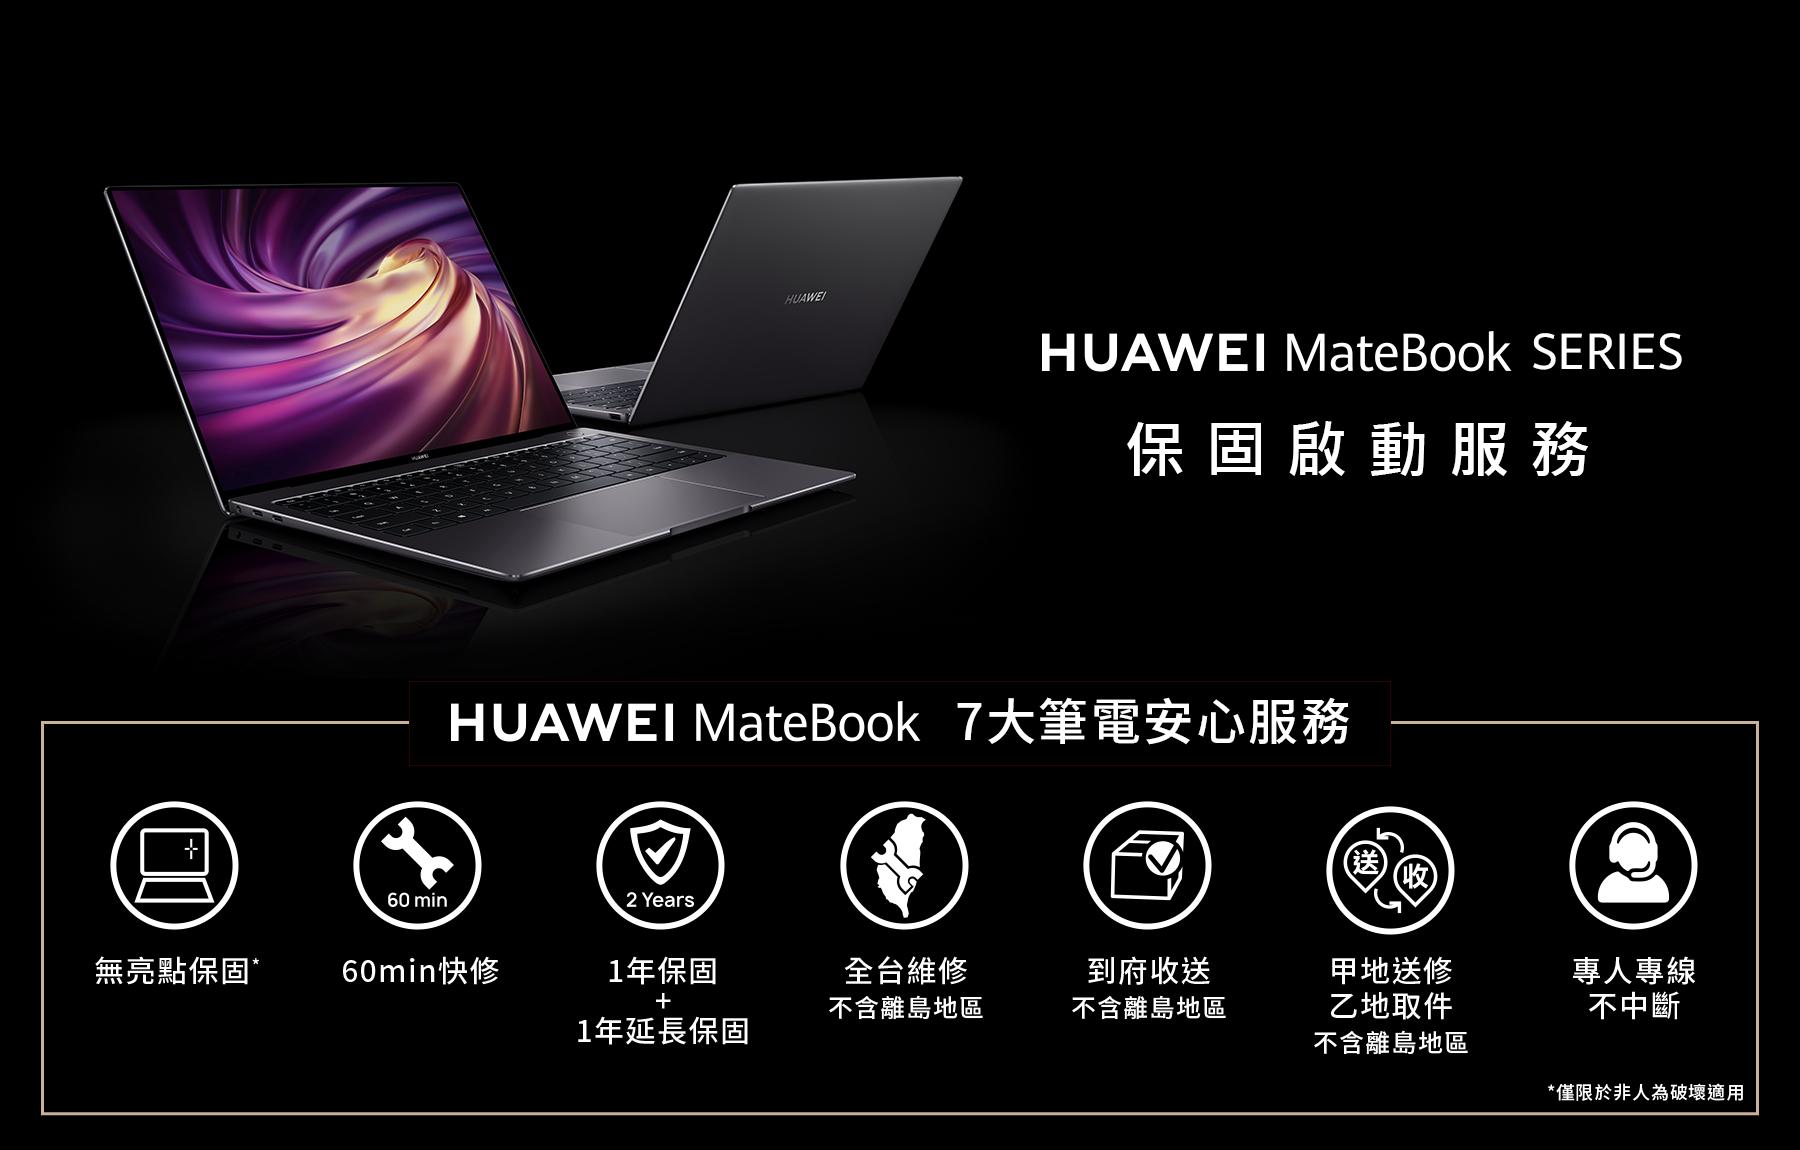 HUAWEI MateBook保固活動